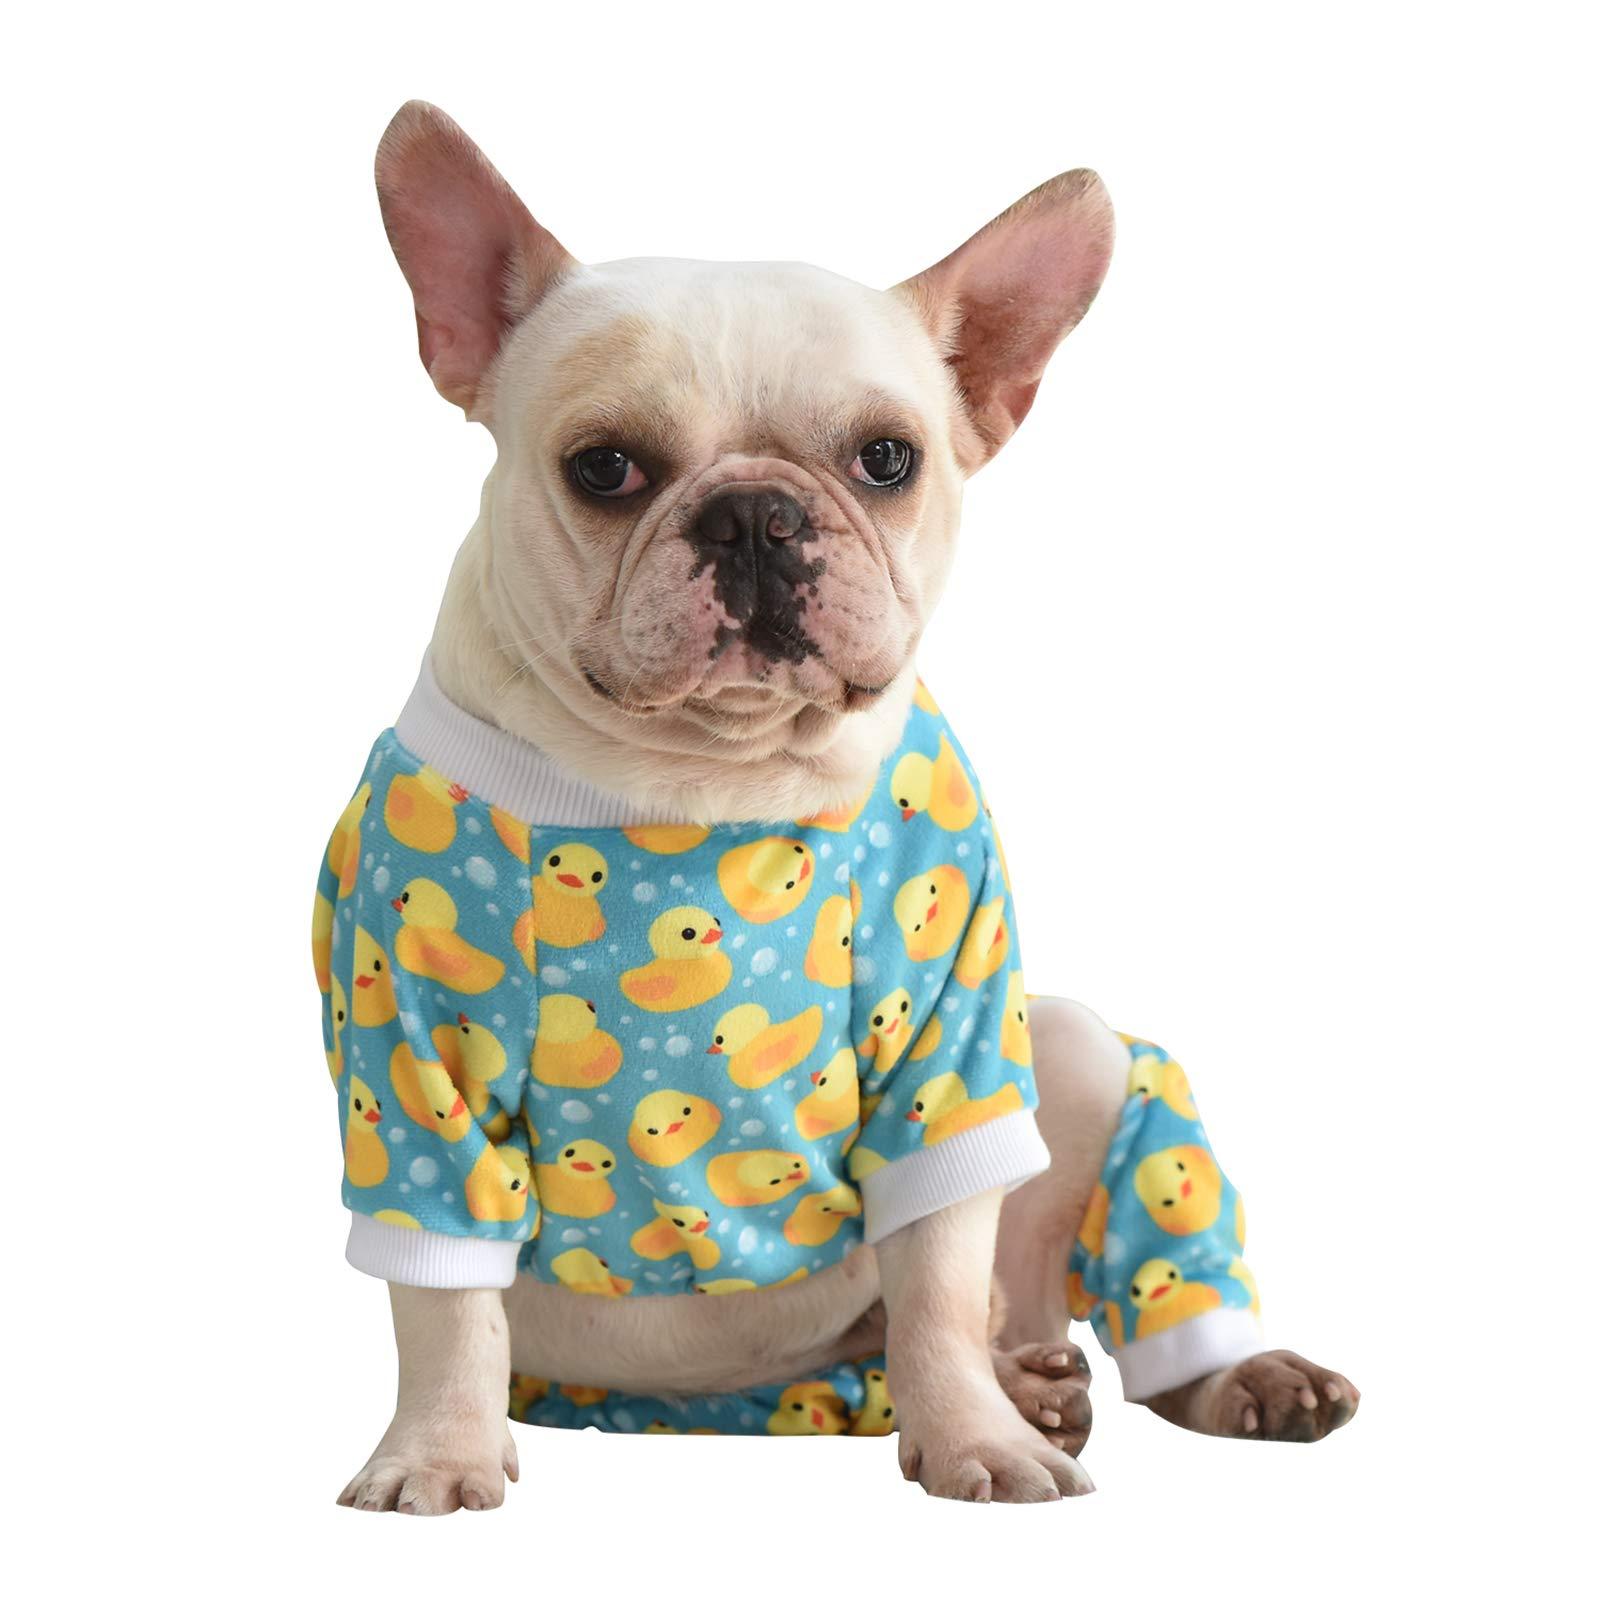 CuteBone-Dog-Pajamas Cutest 10 Pajamas for Dogs on Amazon in 2021/2022